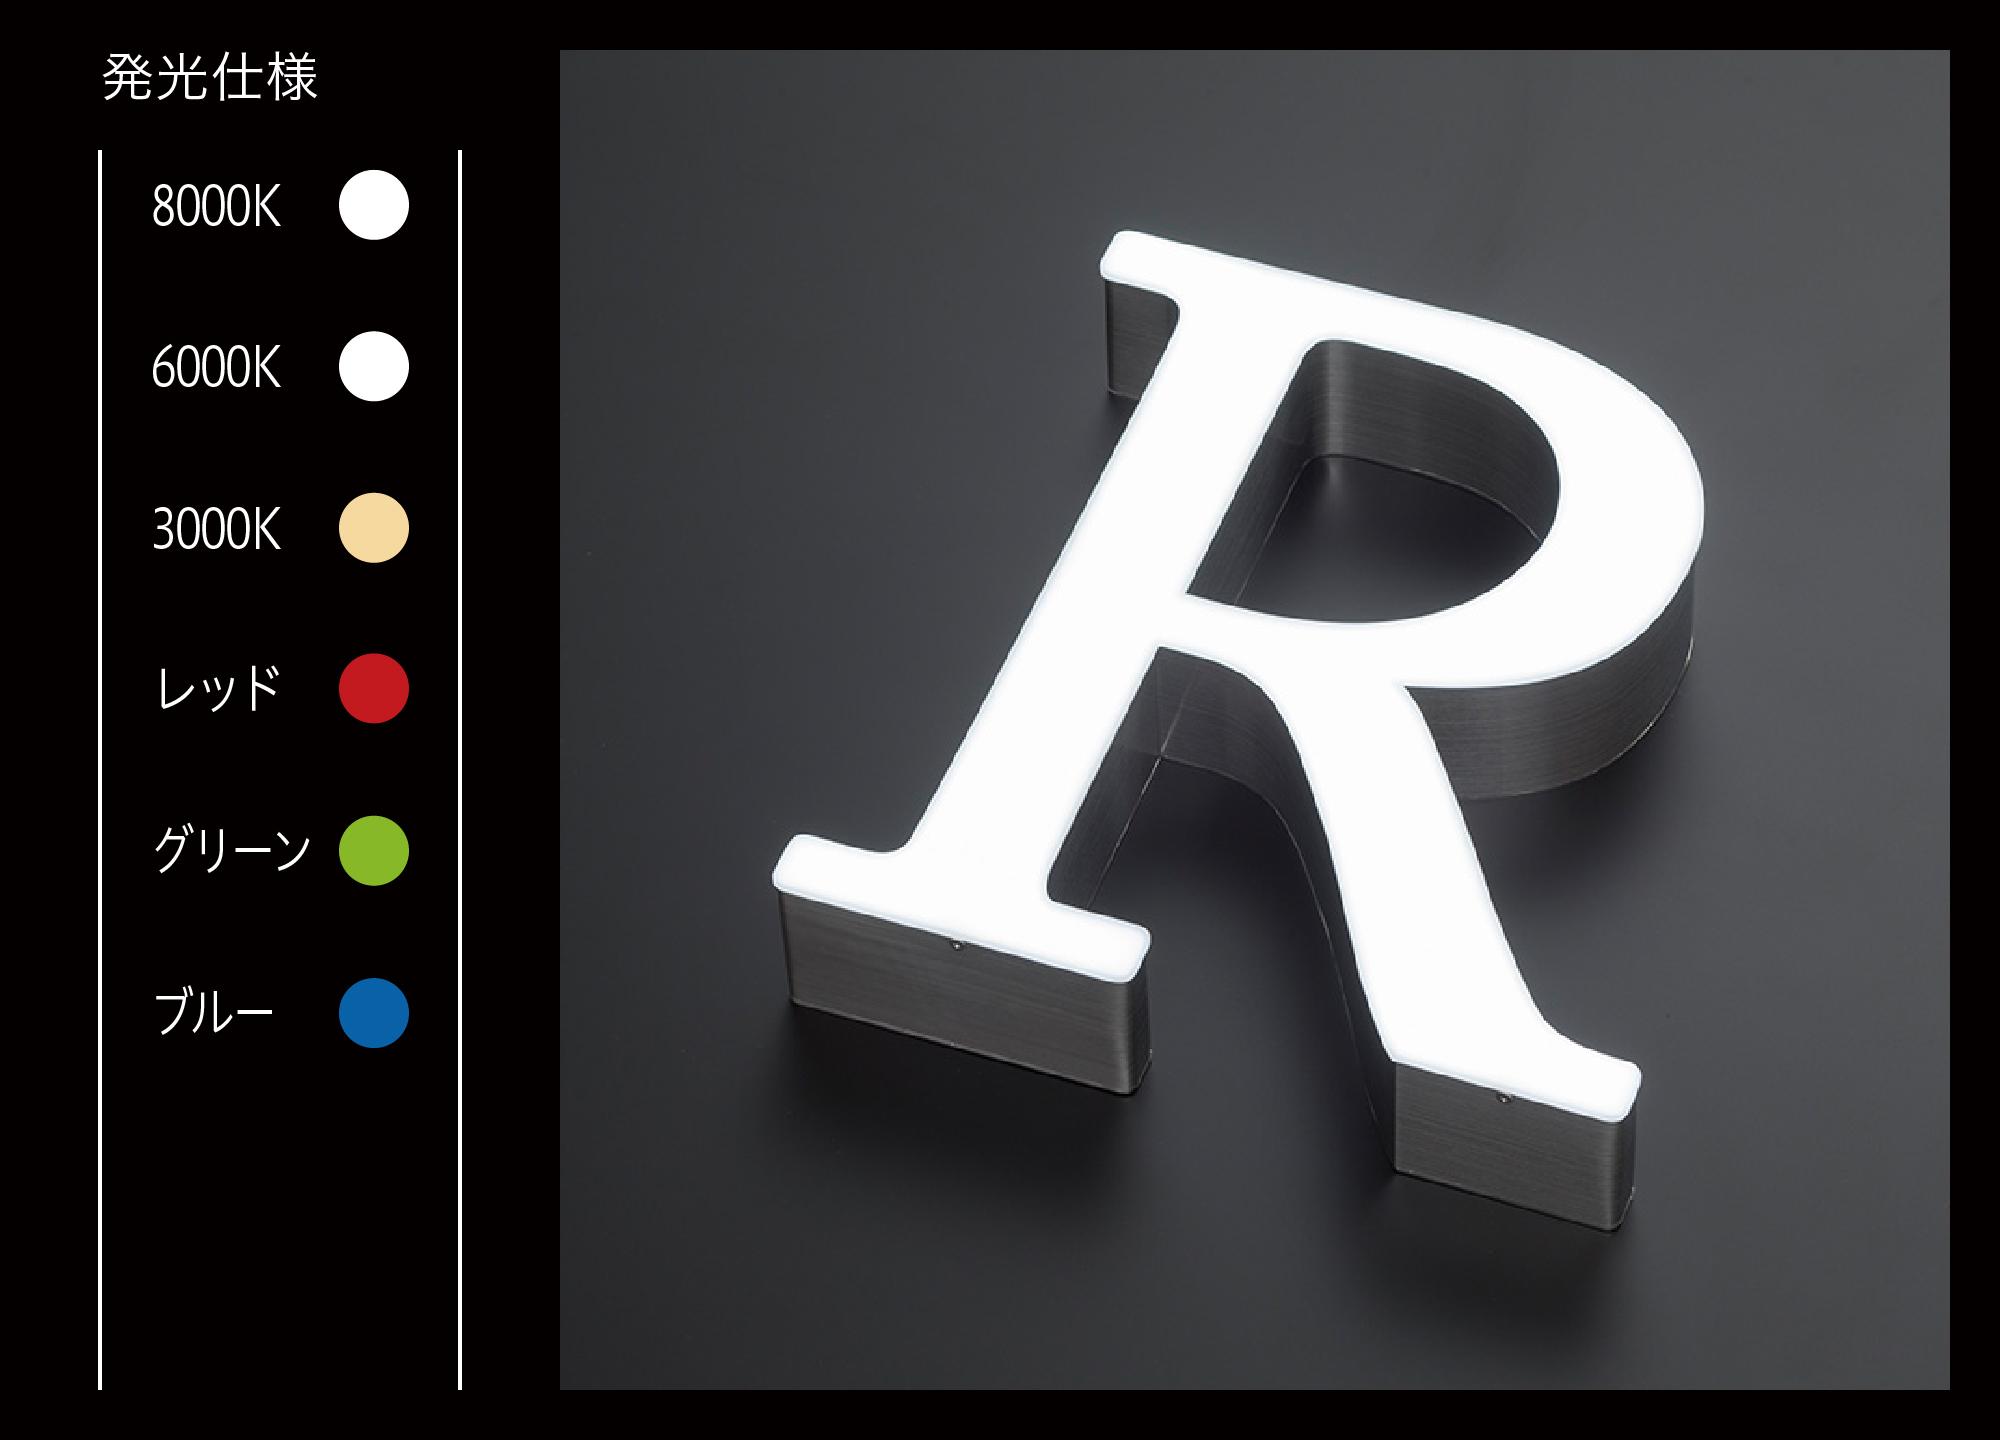 LEDサイン、LED看板のLEDIUS SIGN PRO FRONT CHANNEL